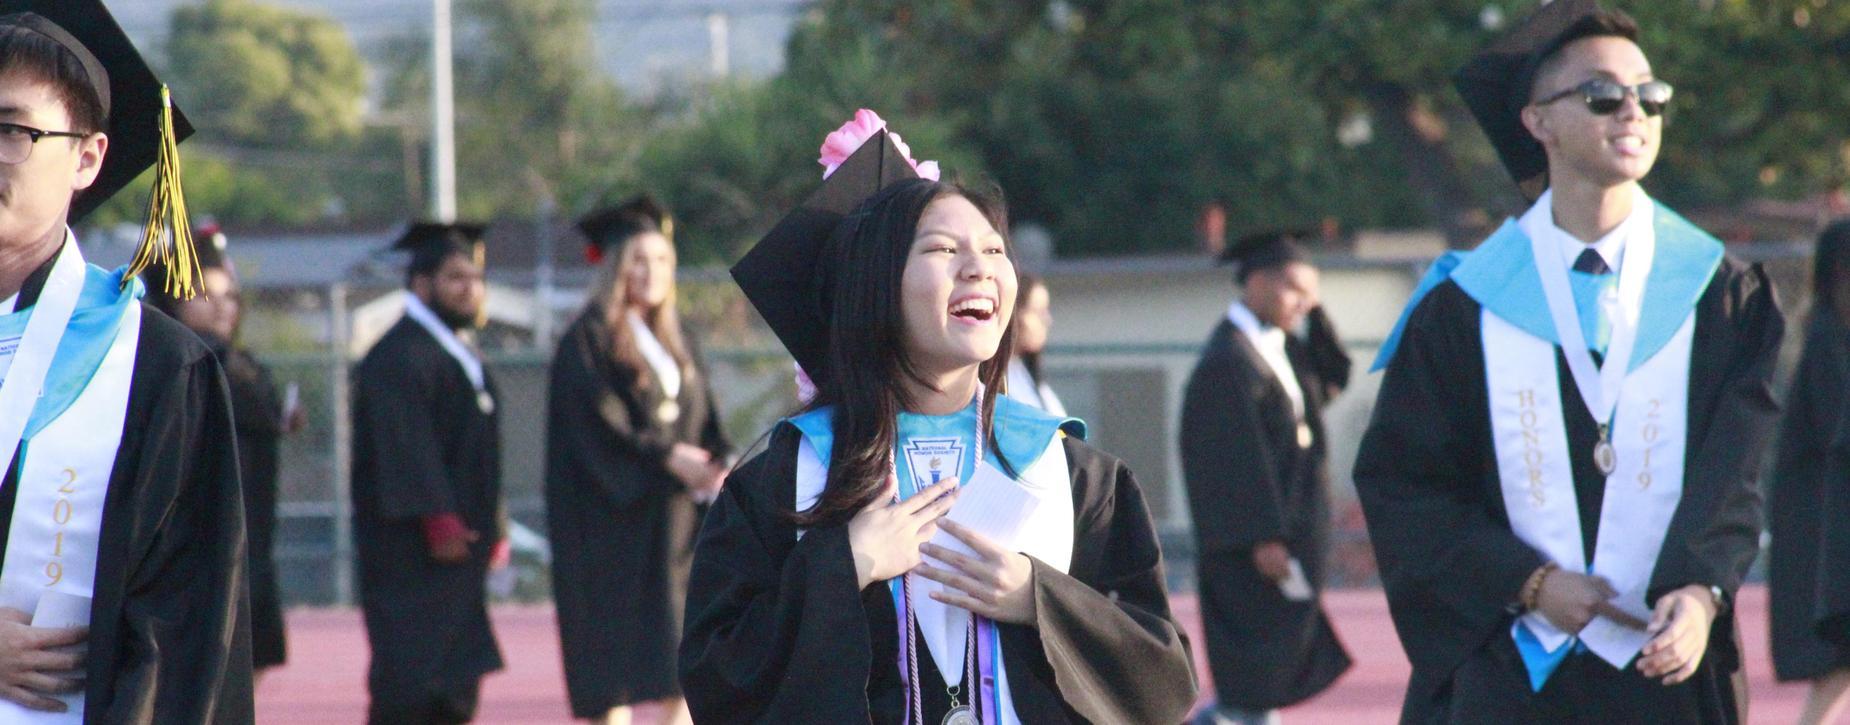 Female Graduate Student holding diploma